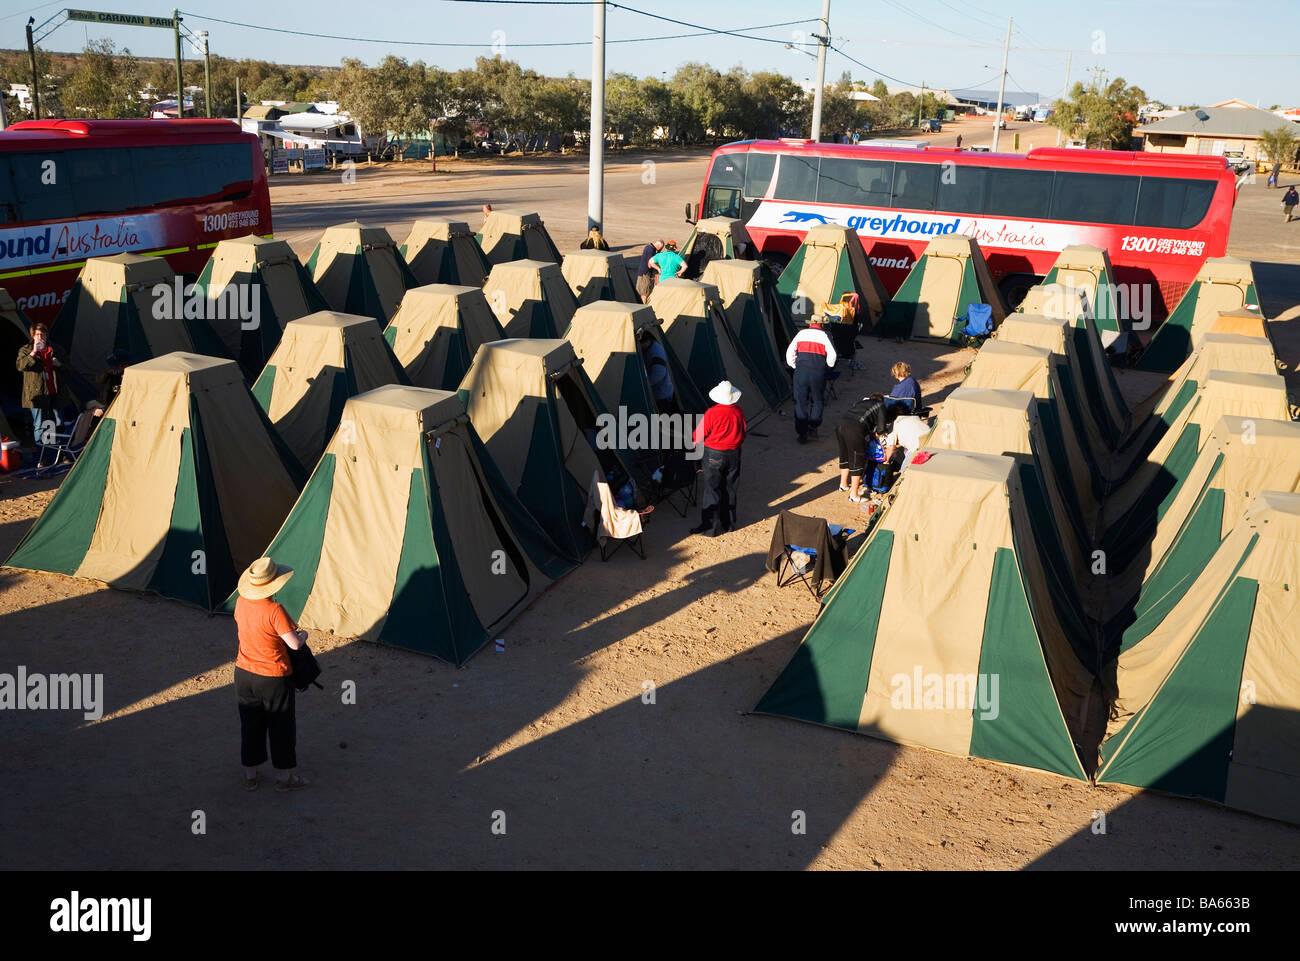 Tent city at Birdsville during the annual Birdsville Races.  Birdsville, Queensland, AUSTRALIA - Stock Image